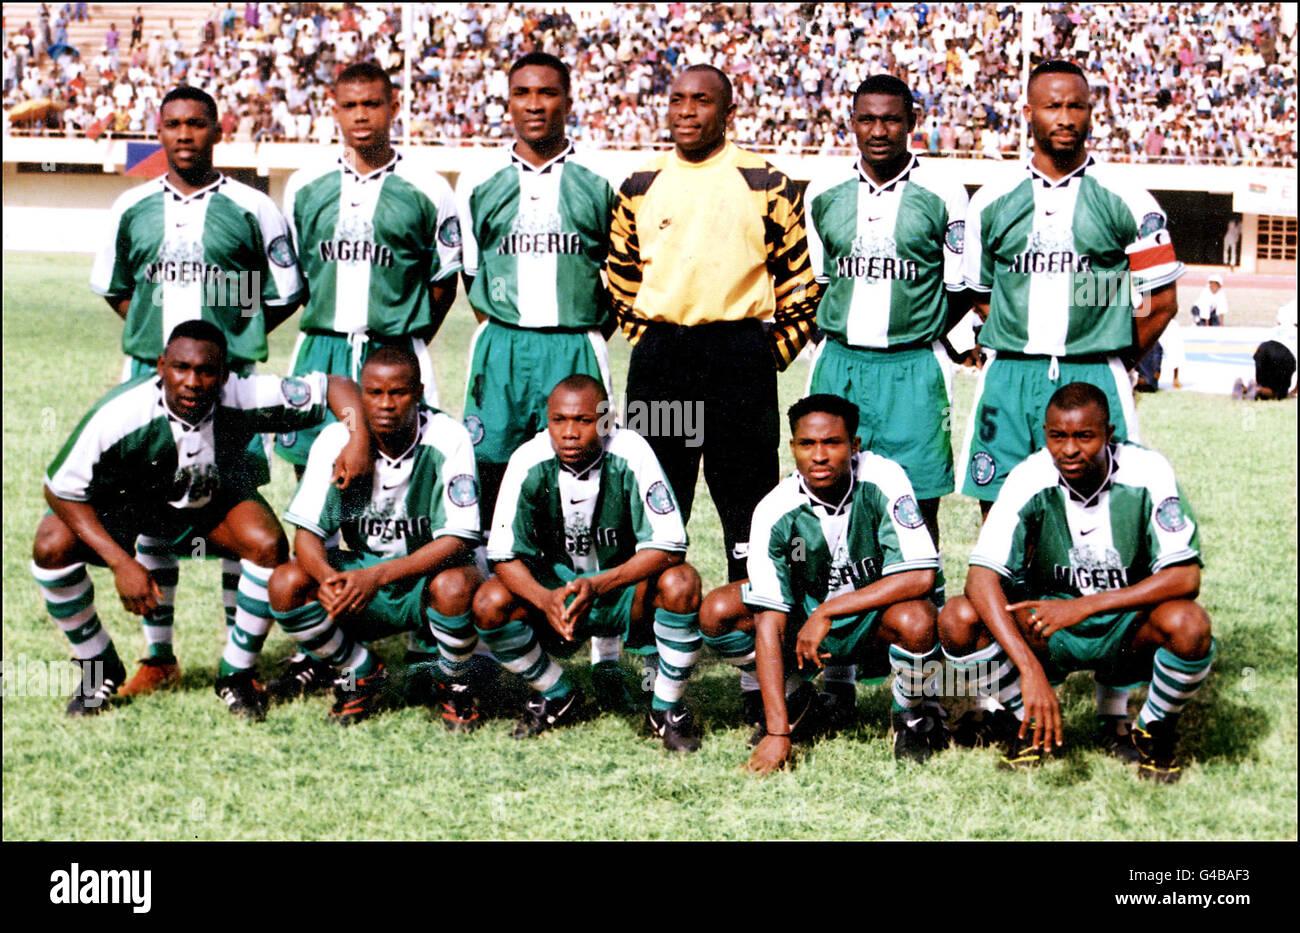 World Cup 1998 AFP PHOTO Nigeria (L-R standing) Austin Okocha, Sunday Oliseh, Uche Okafor, Ike Shoromu, Garba Lawal, - Stock Image